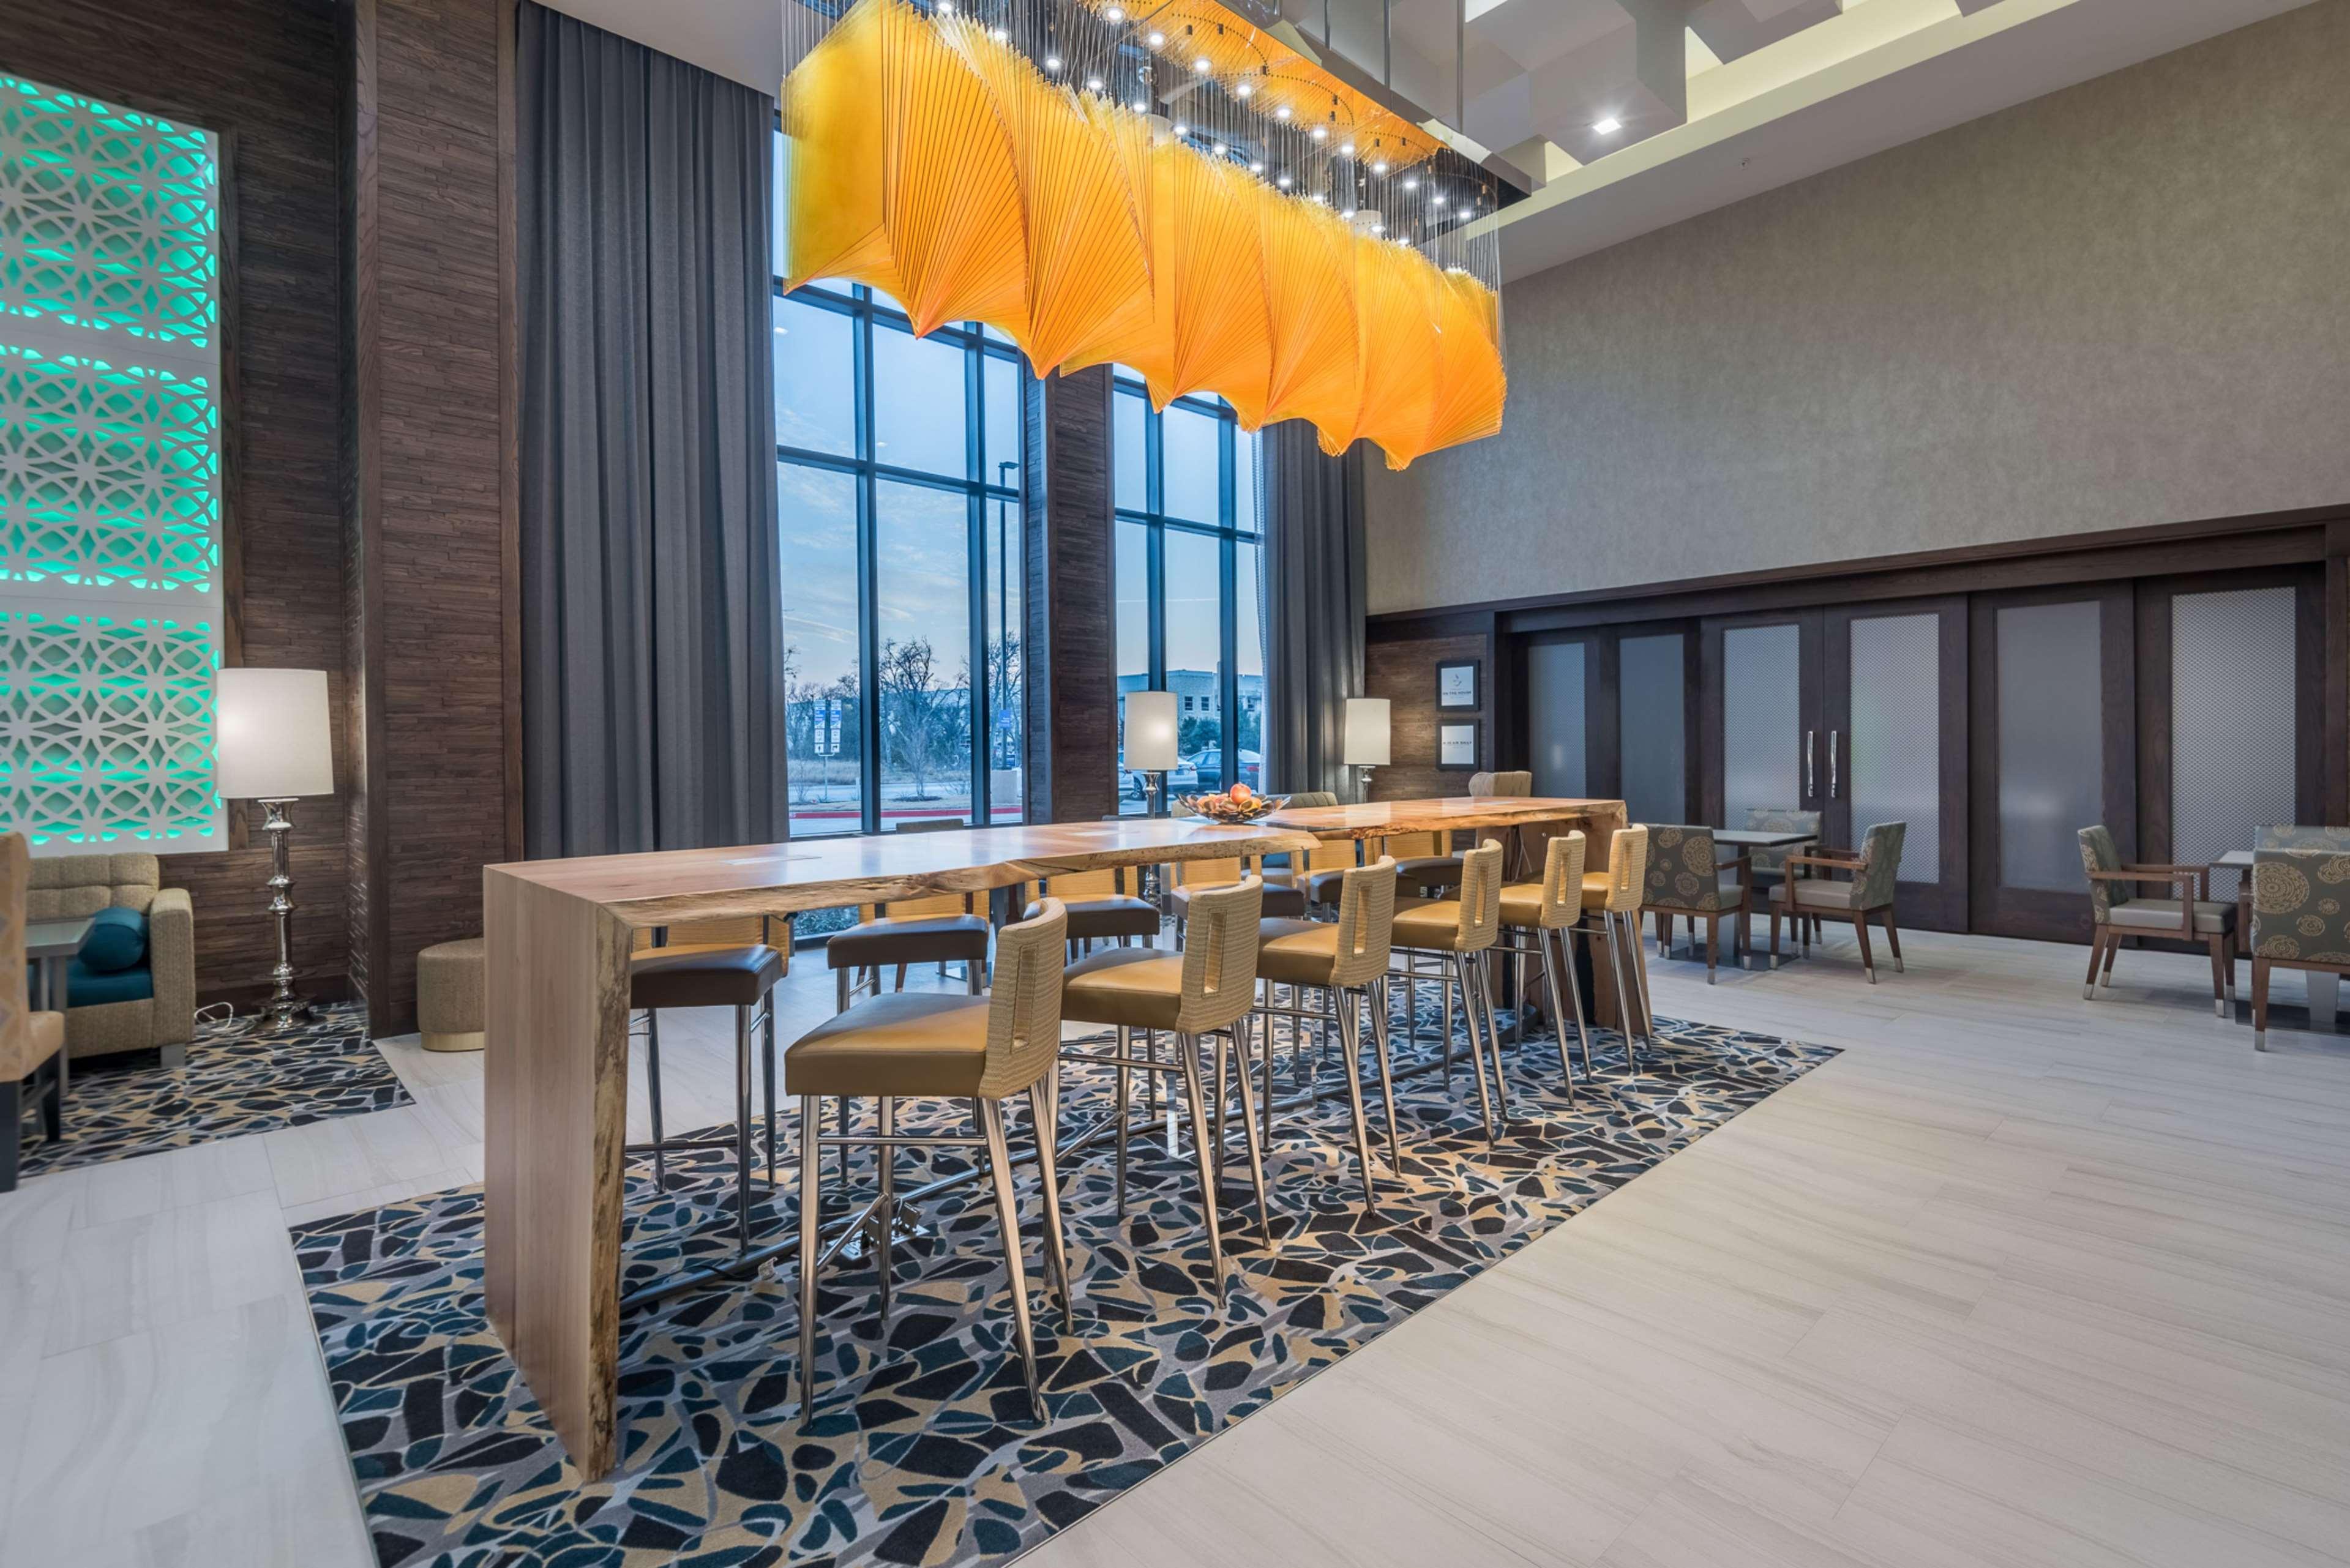 Hampton Inn & Suites Dallas-The Colony, TX image 7